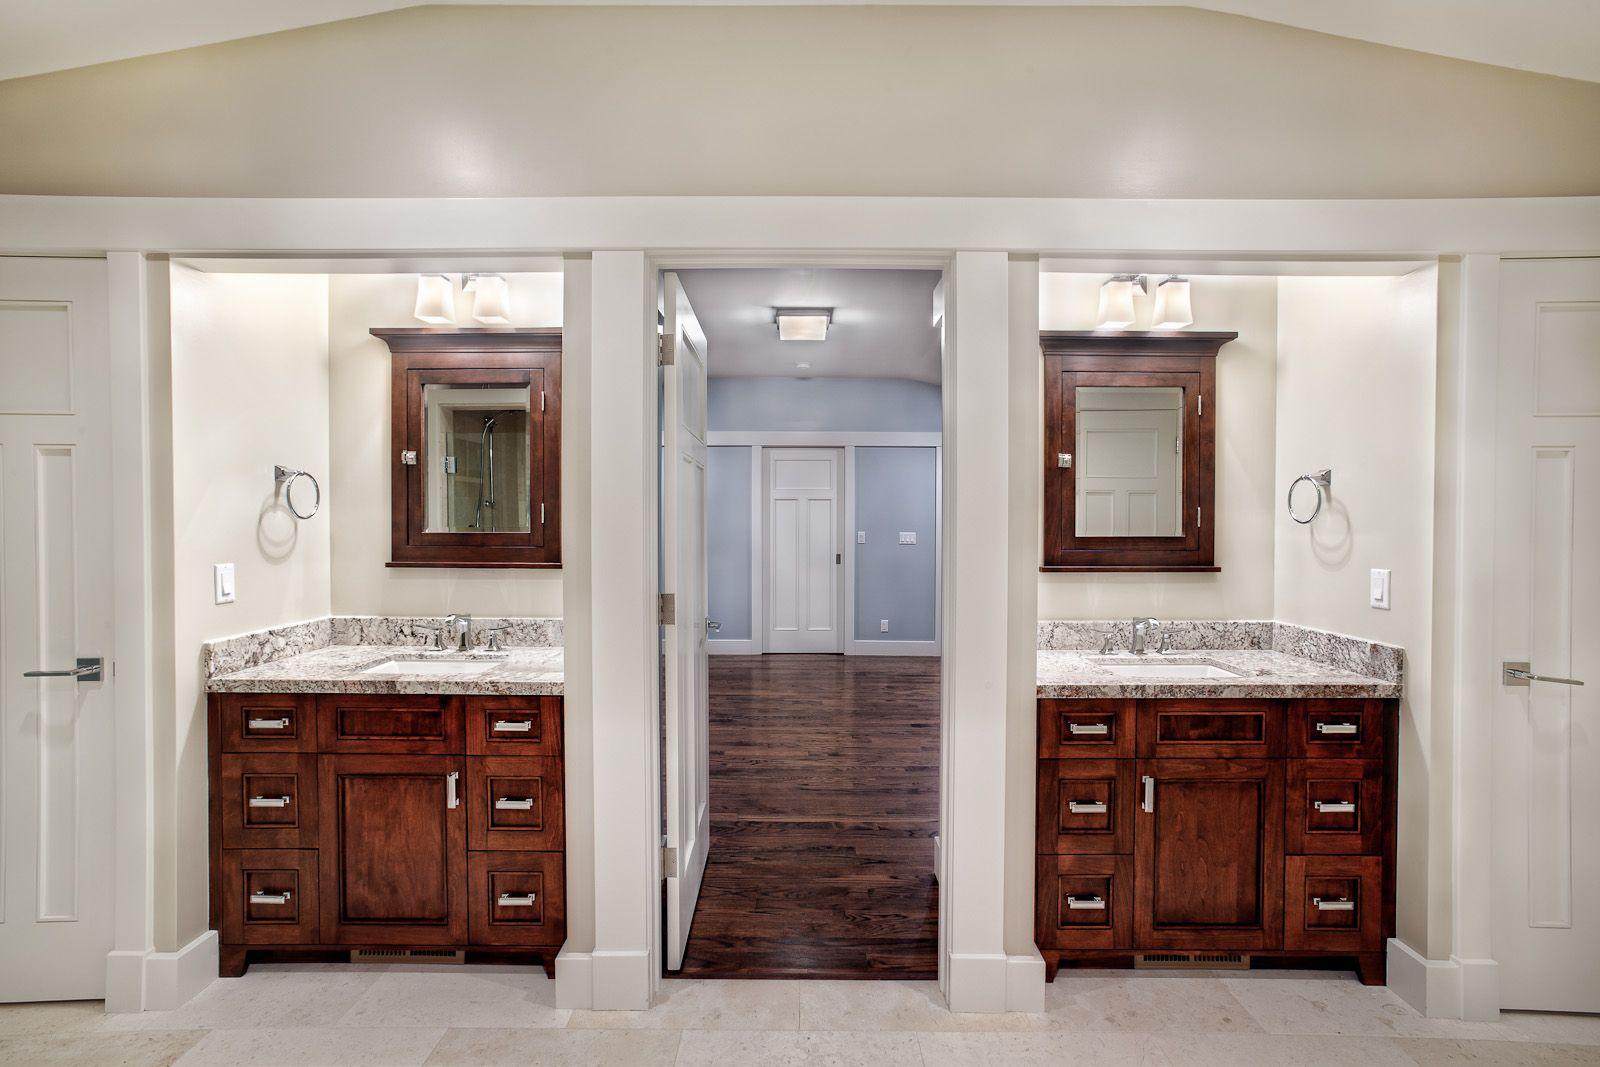 Superb Split Double Vanity Bathroom Design Bathroom Vanity Interior Design Ideas Skatsoteloinfo